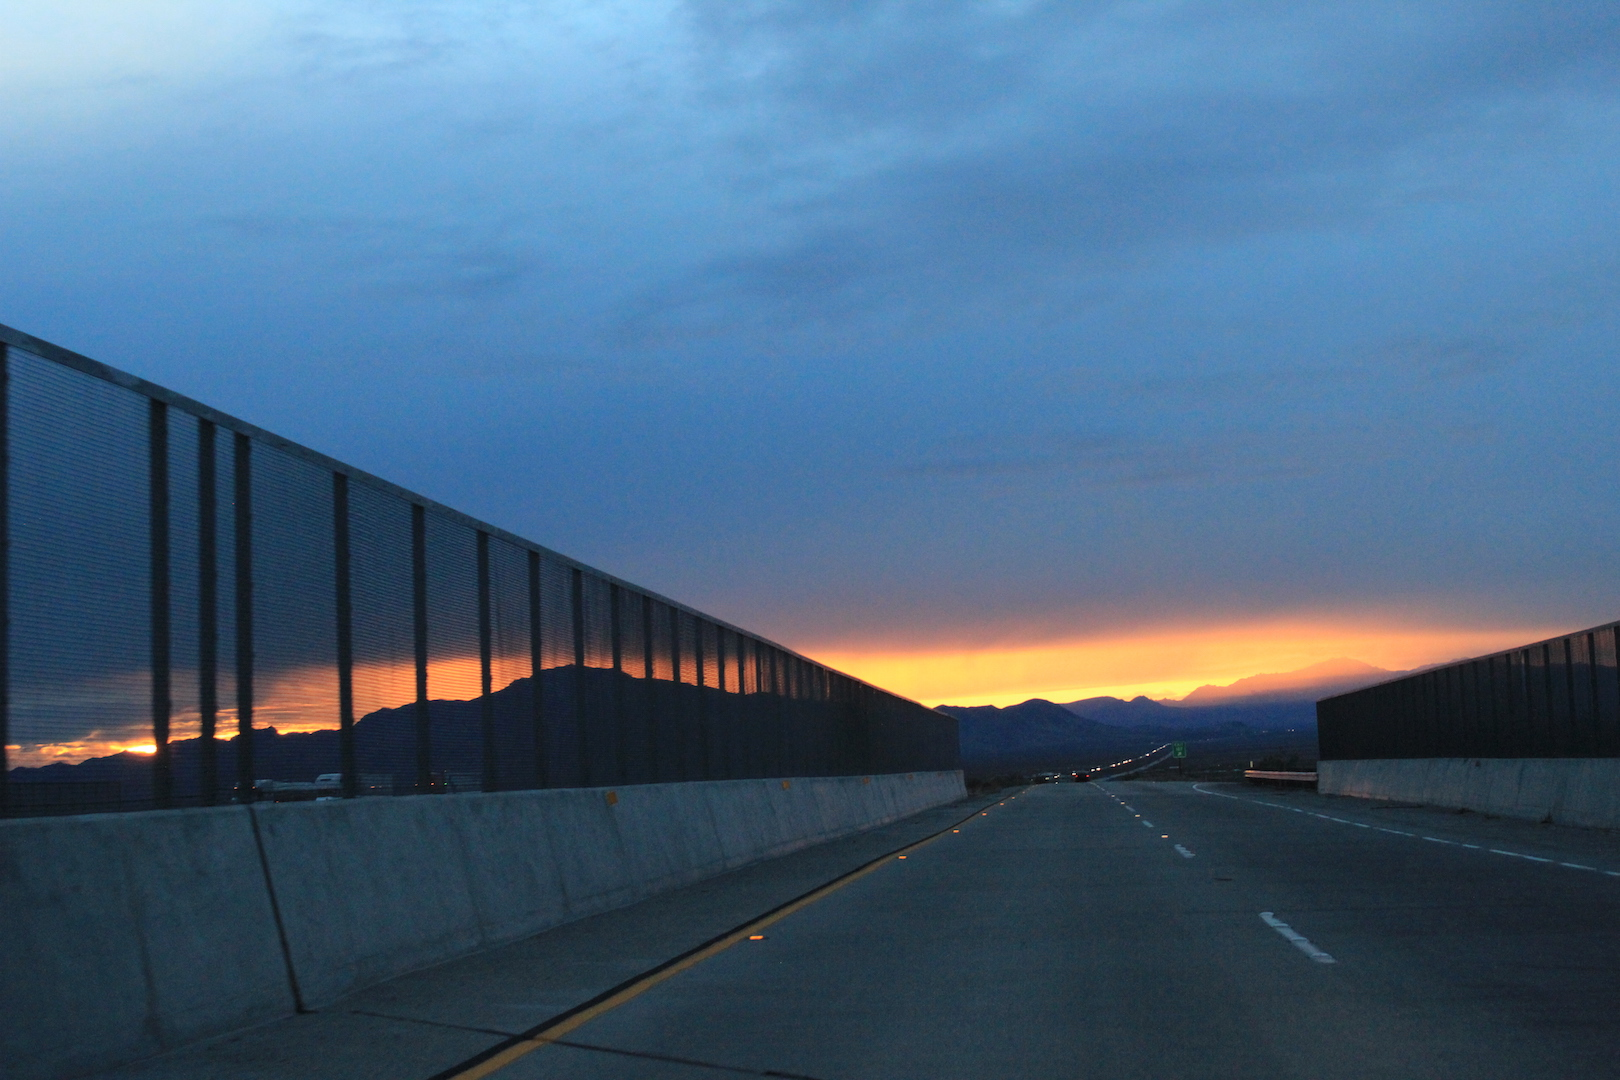 driving into california